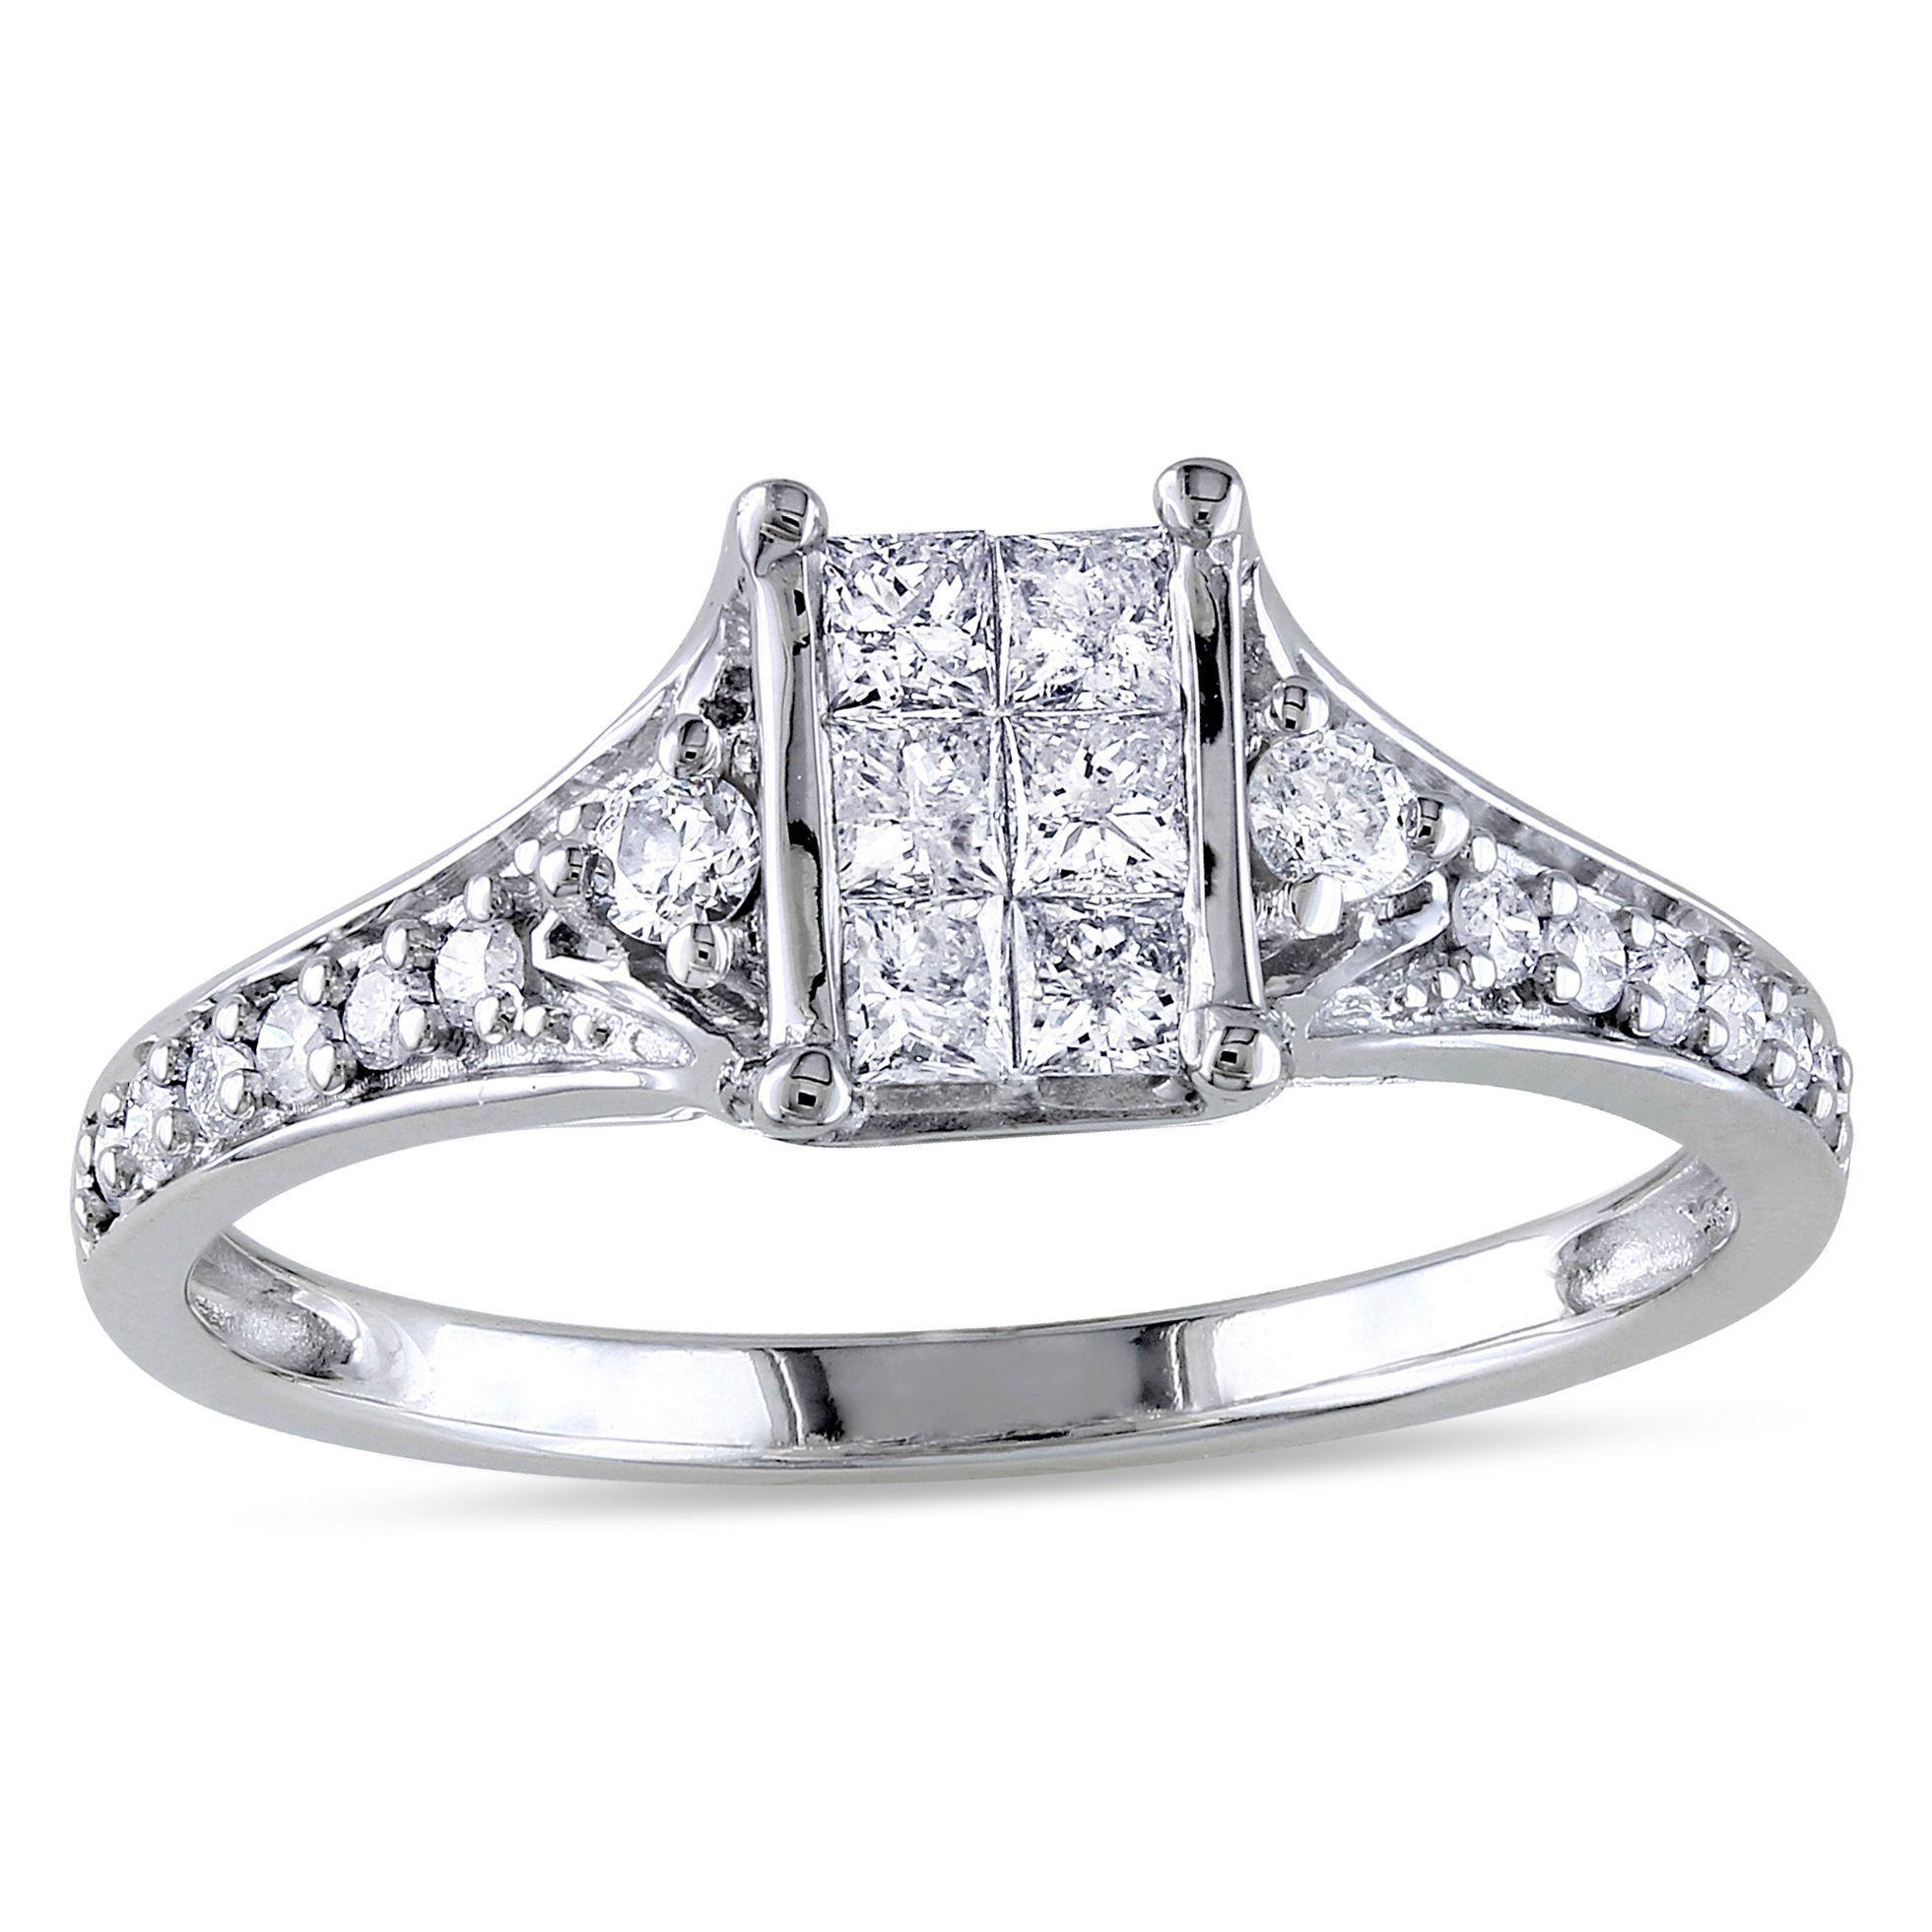 Miadora signature collection 14k white gold 1ct tdw diamond double row - Miadora 10k White Gold 1 2ct Tdw Princess Cut Diamond Engagement Ring G H